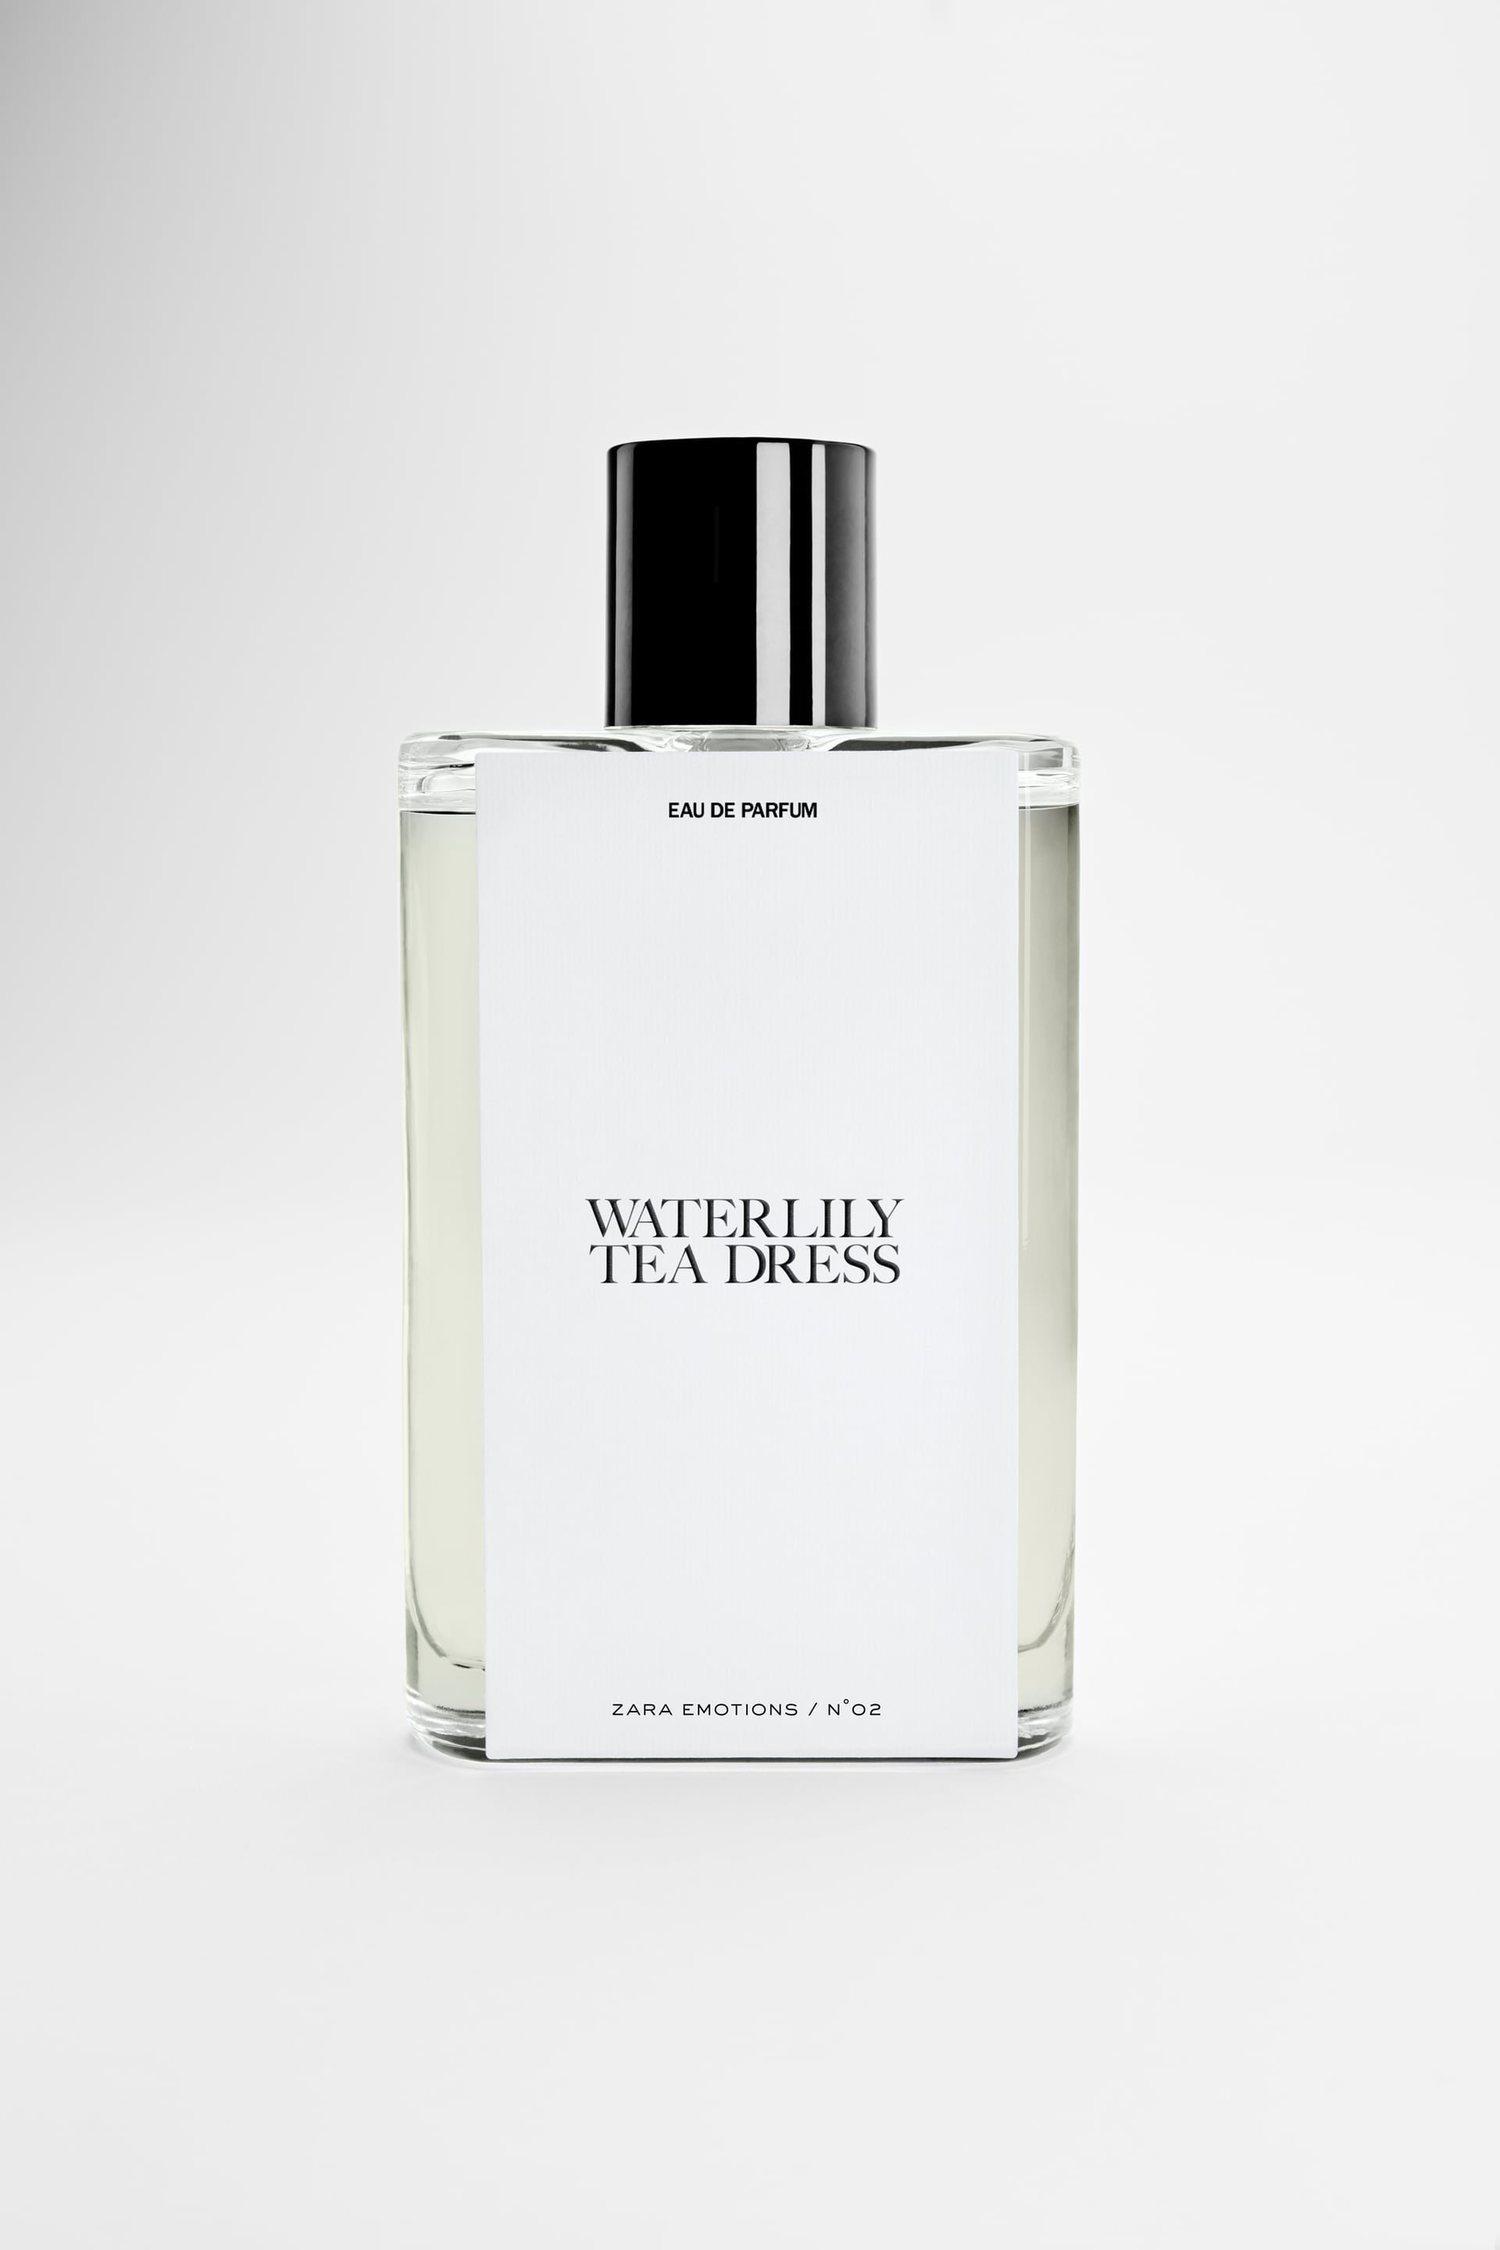 Perfume de Zara x Jo Malone.